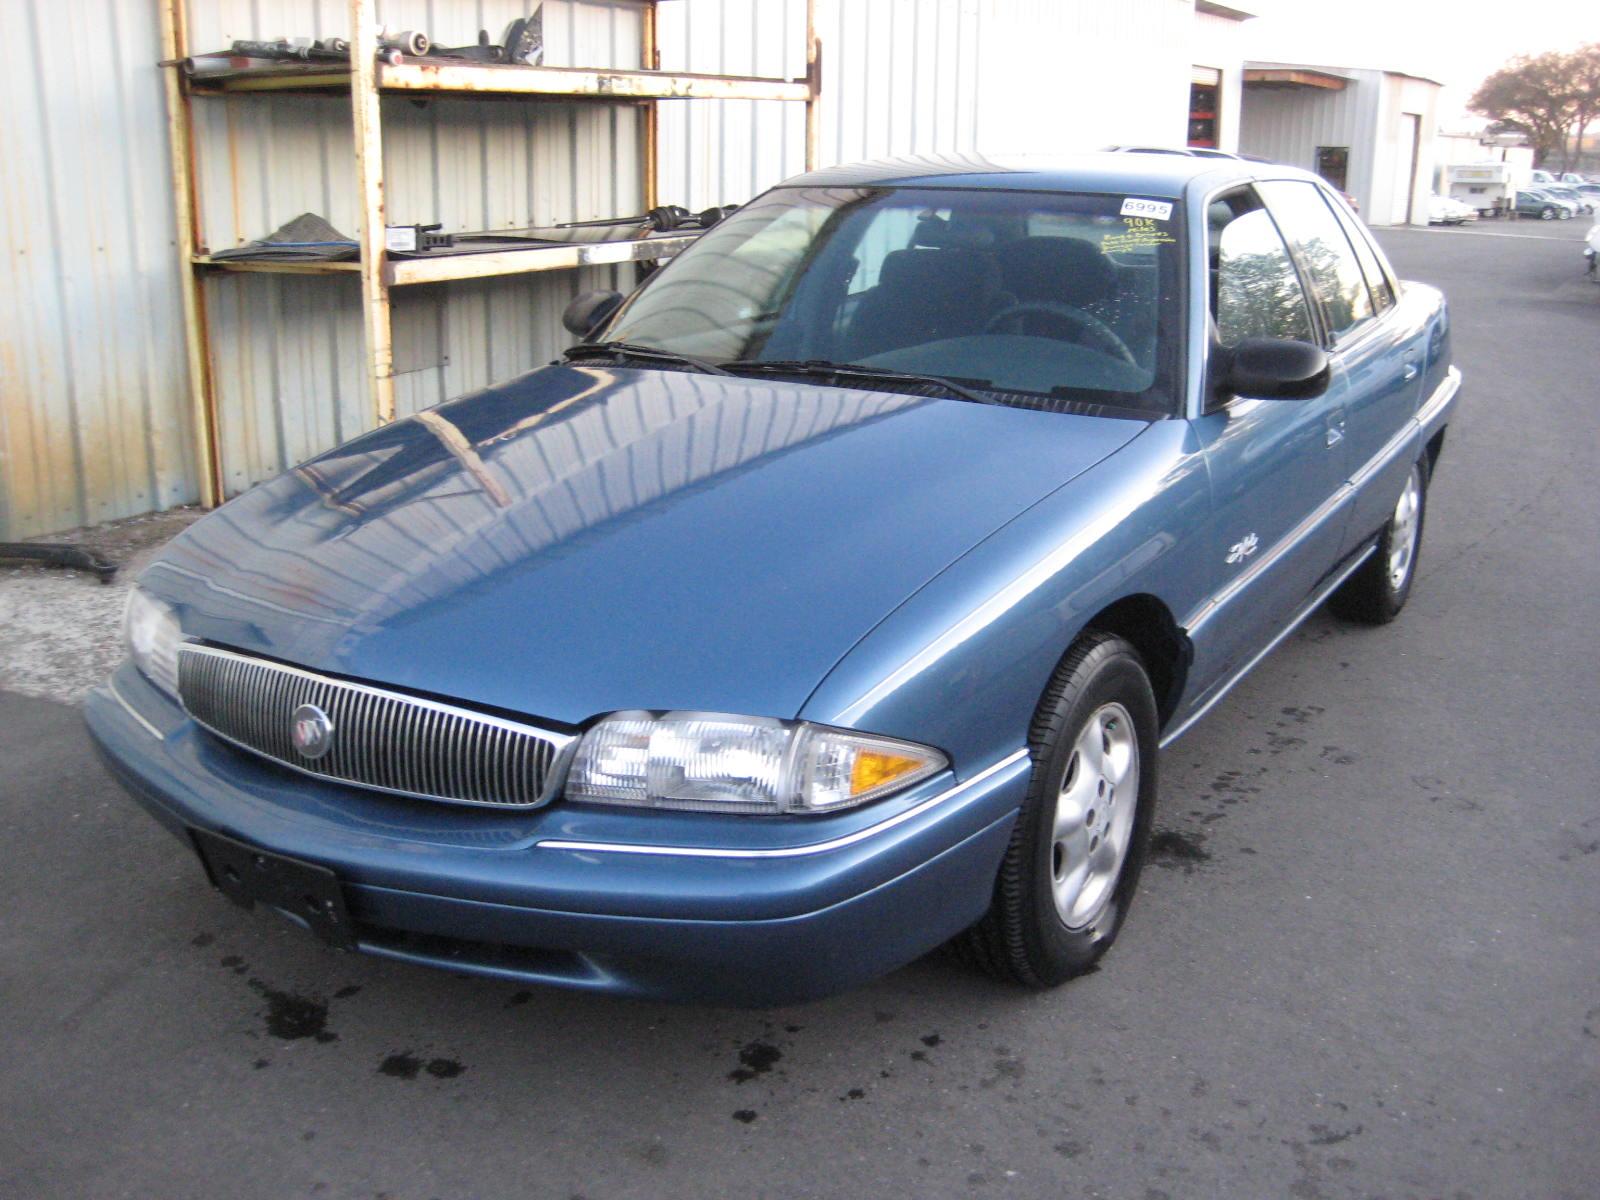 1997 Buick Skylark Image 12